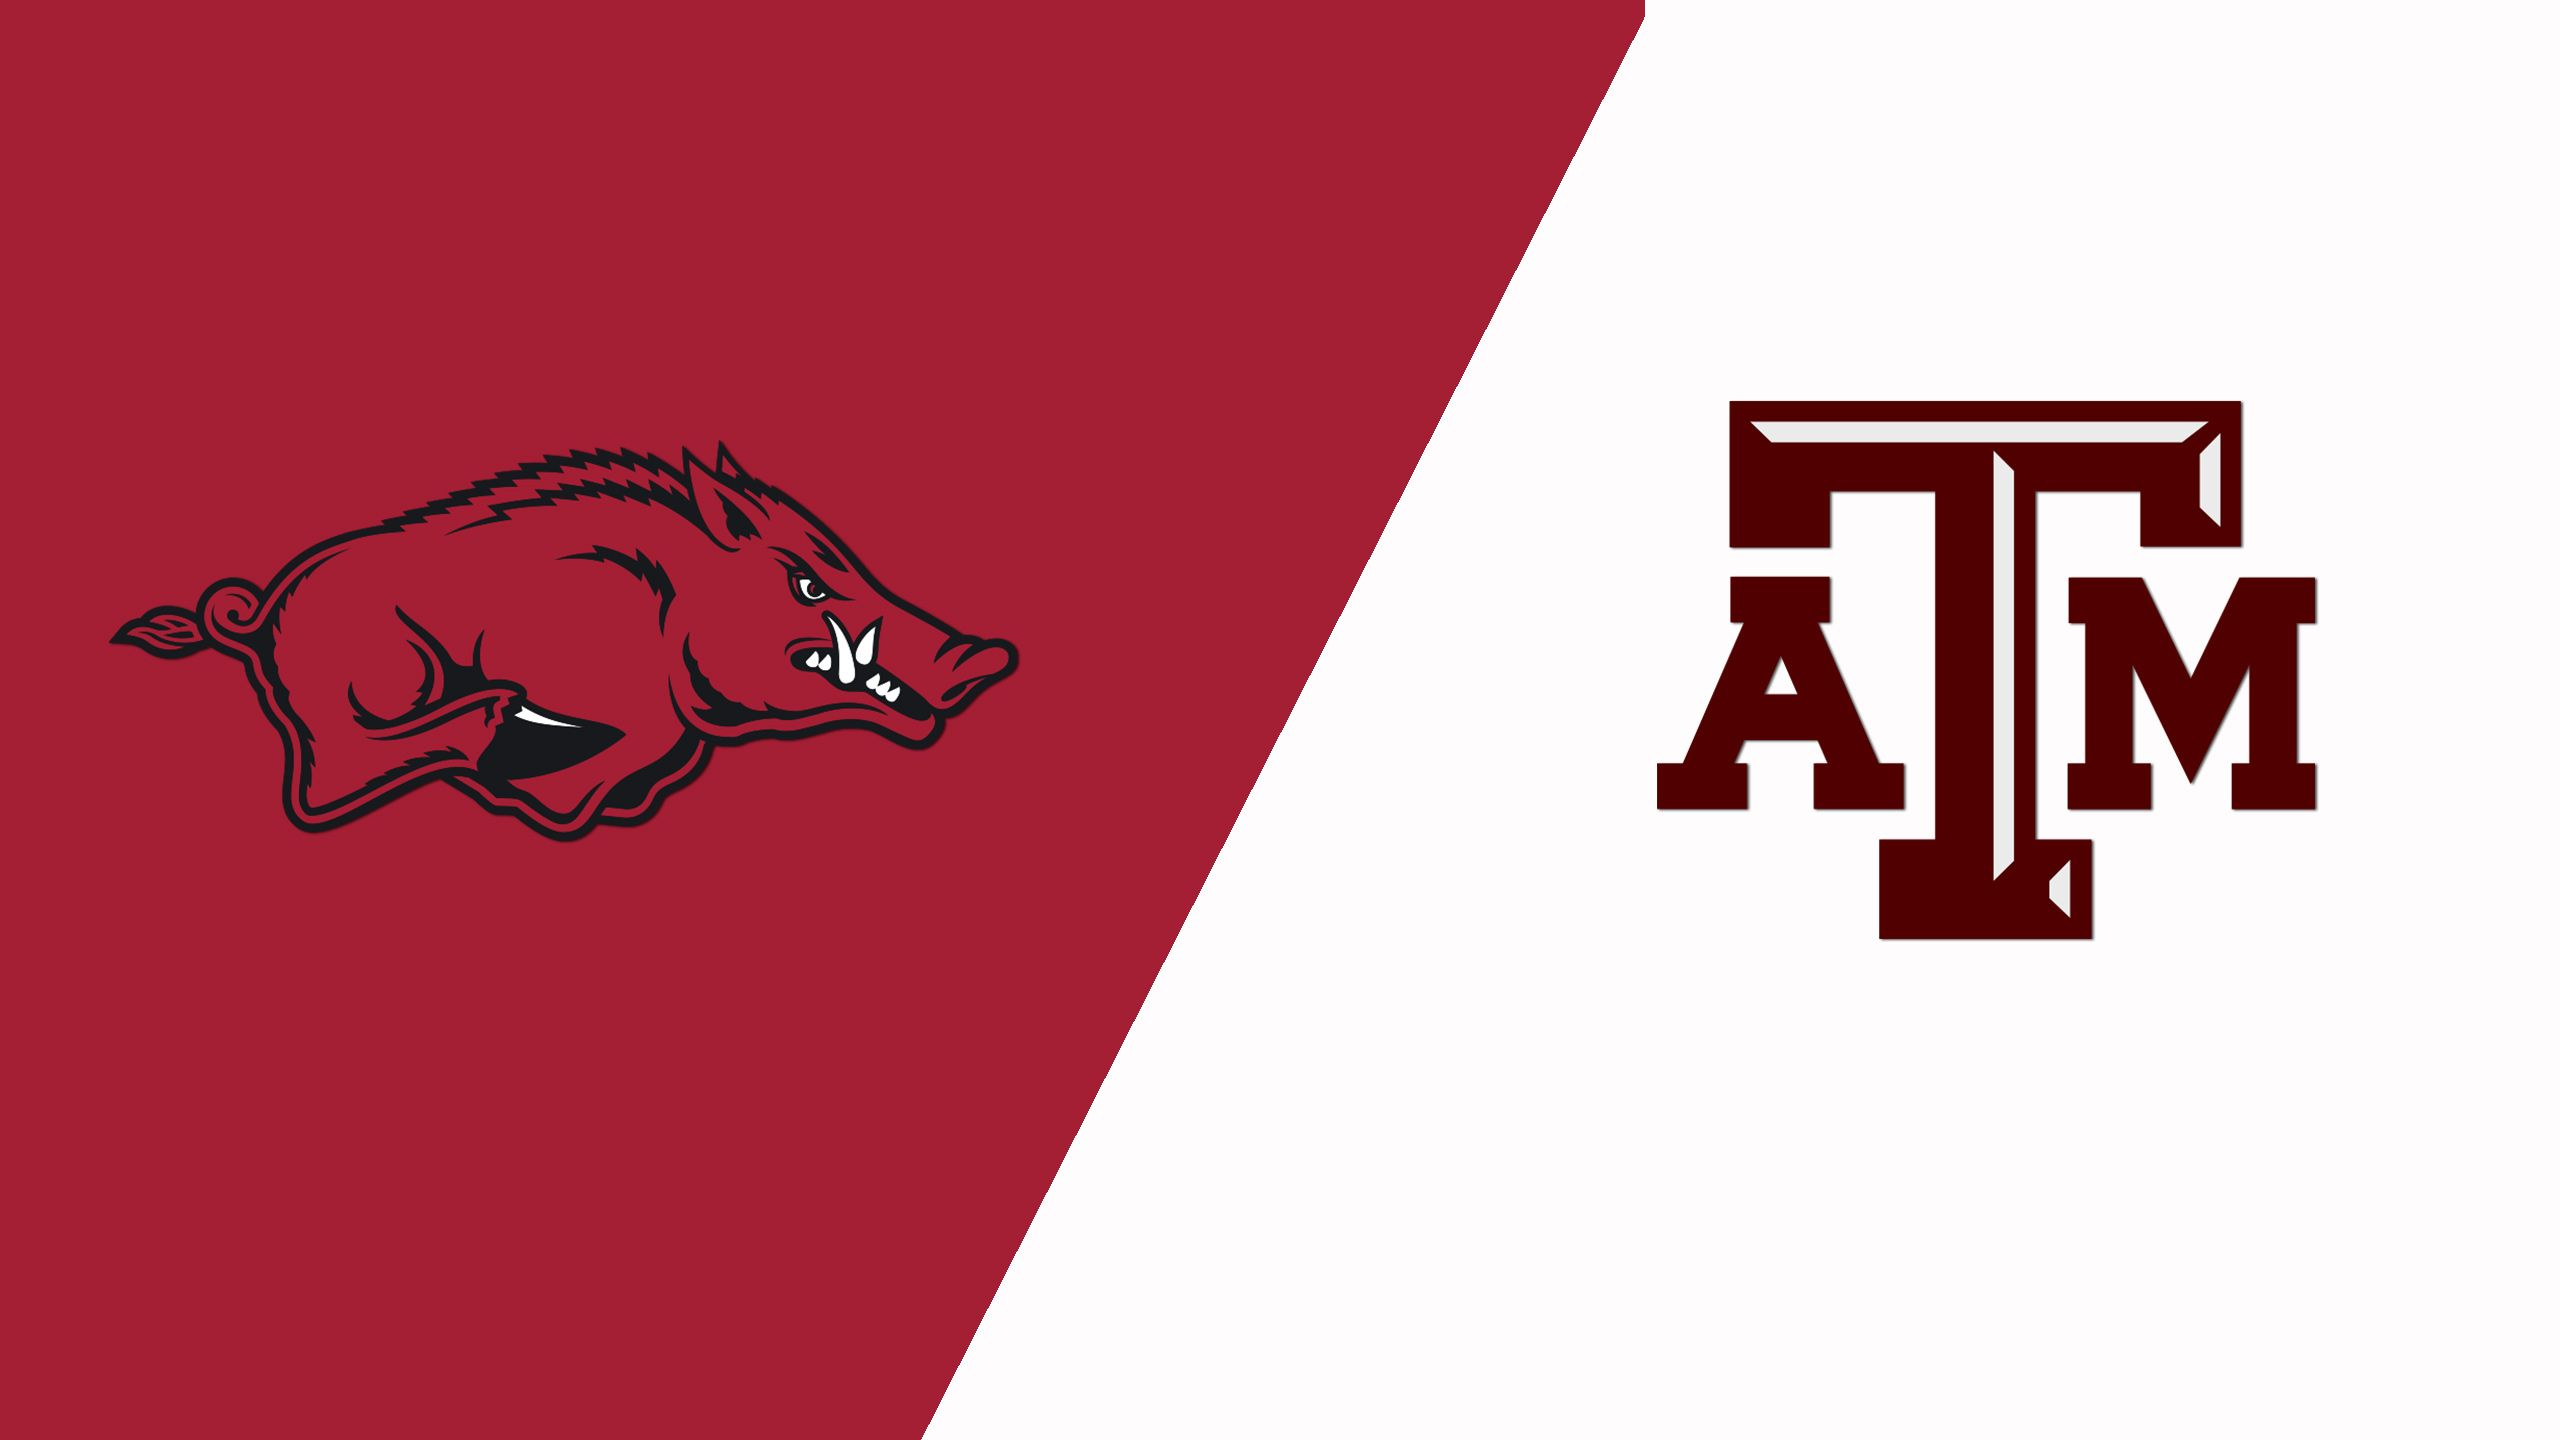 Arkansas vs. #15 Texas A&M (Second Round, Game 2) (SEC Women's Basketball Tournament)